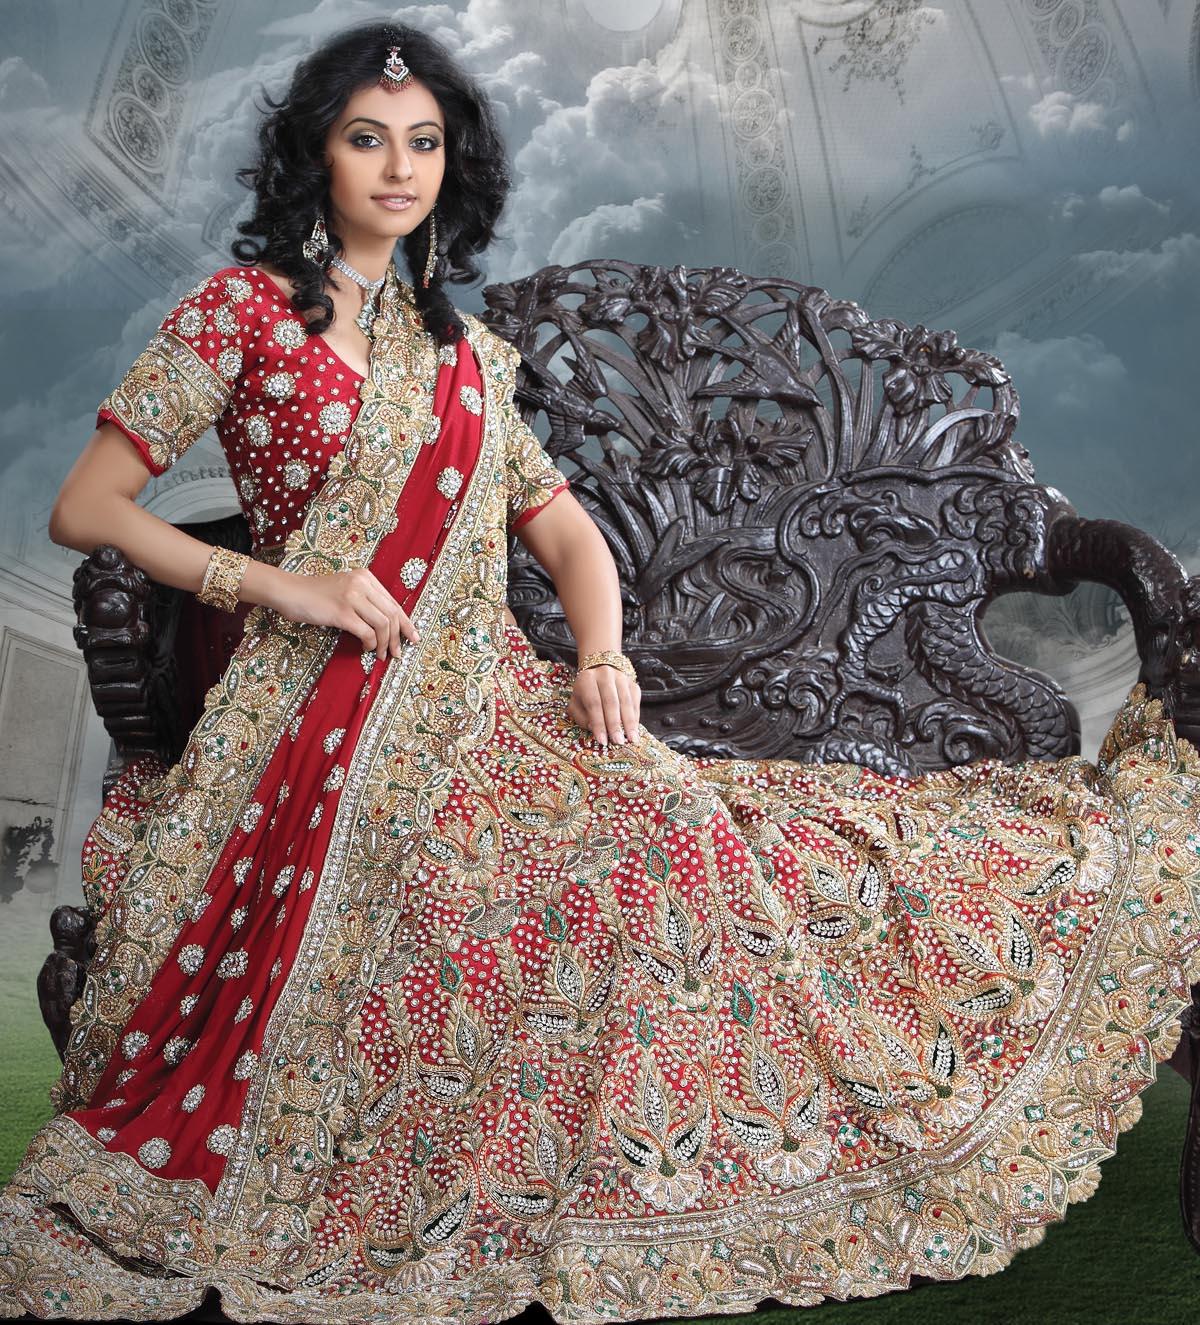 Pakistani Bridal Lehengas: Top 50 Most Stunning Beautiful Bridal Lehangas